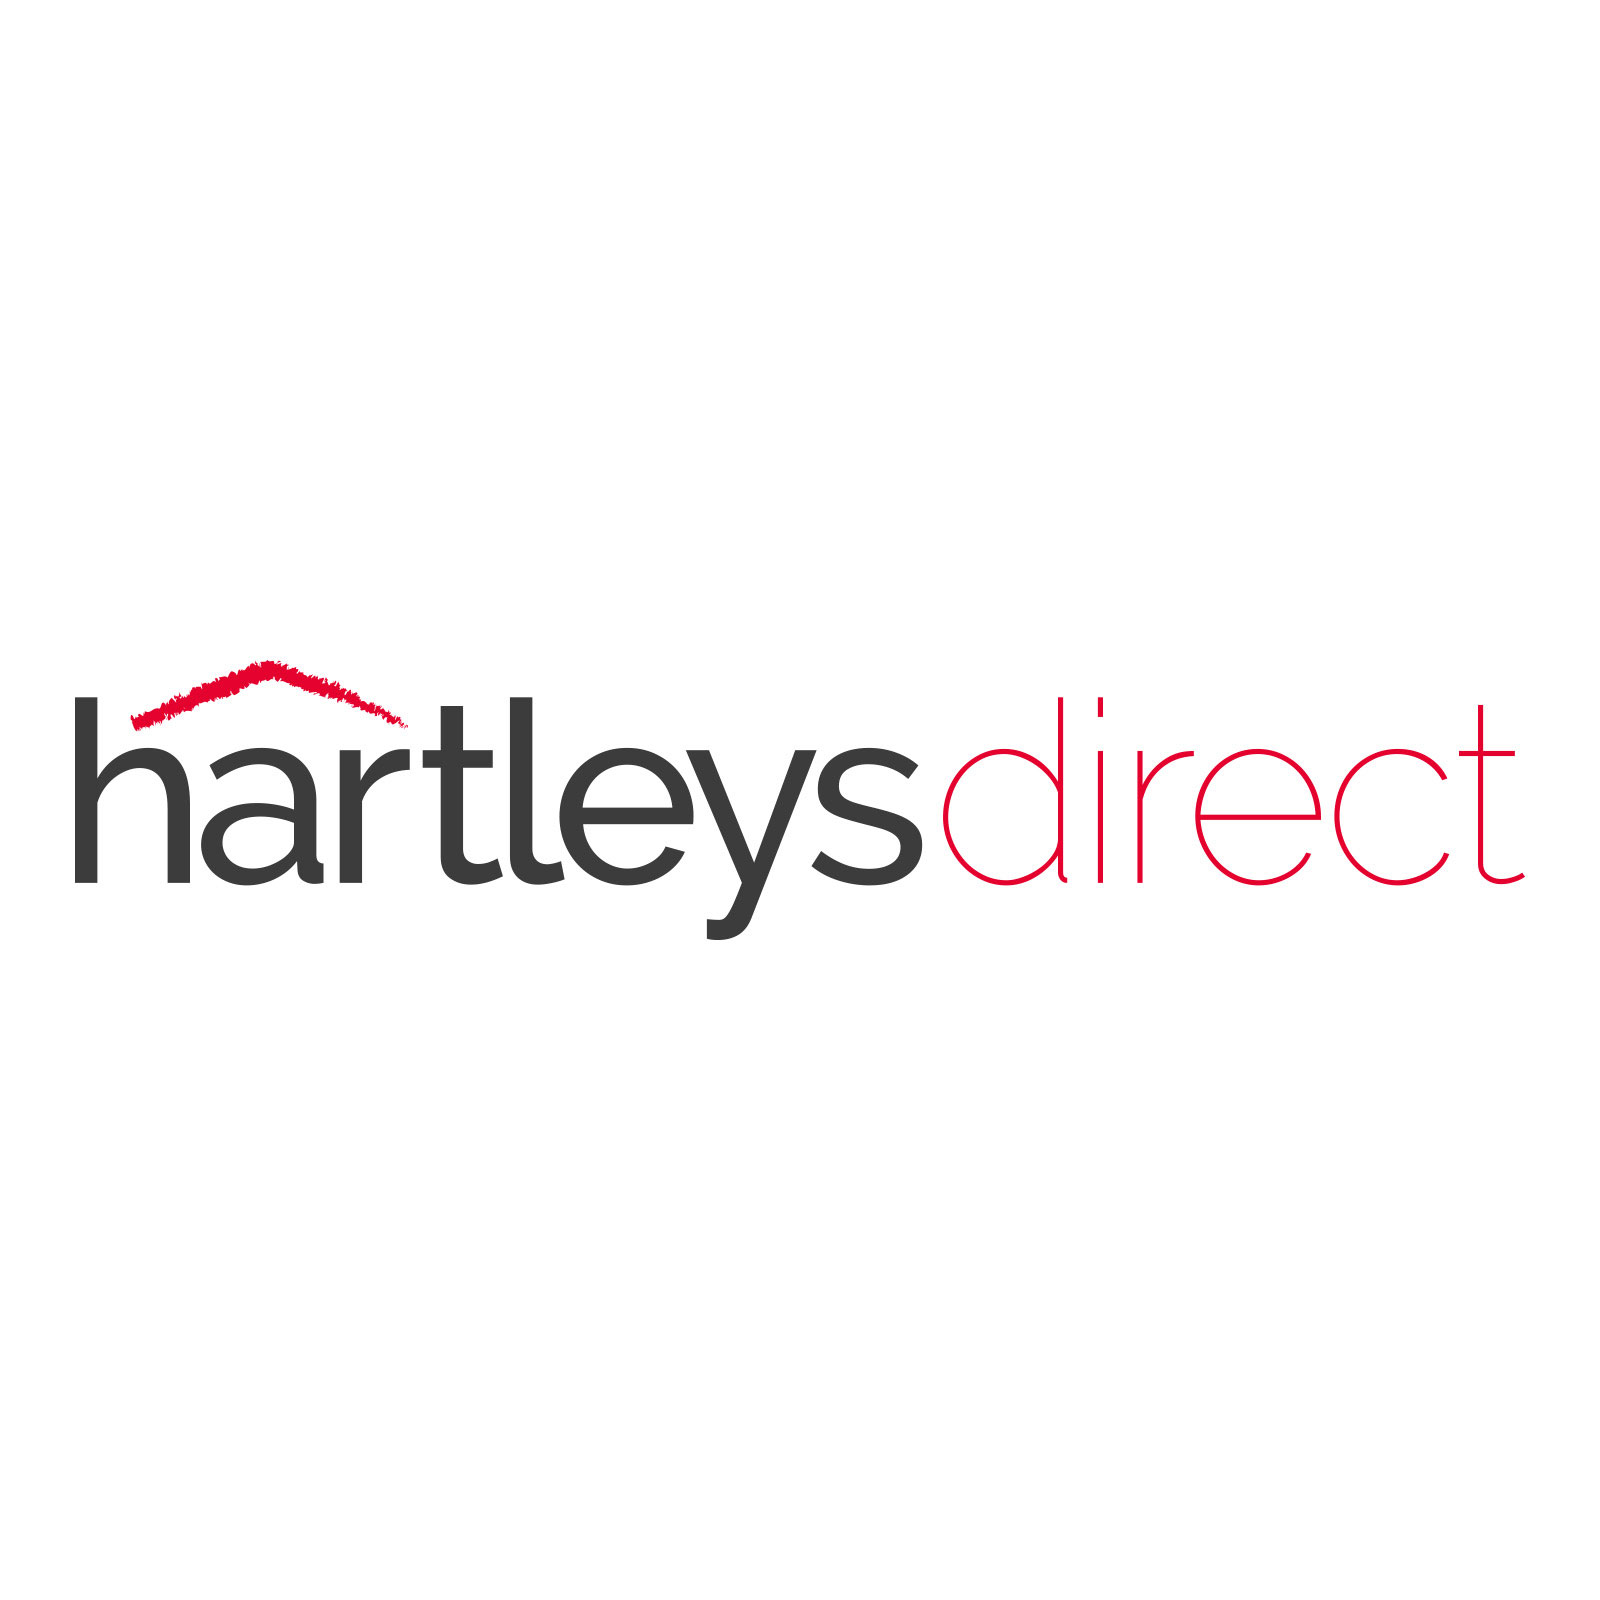 Hartleys-Grey-Rectangular-Fabric-Storage-Box-with-Handle-on-White-Background.jpg